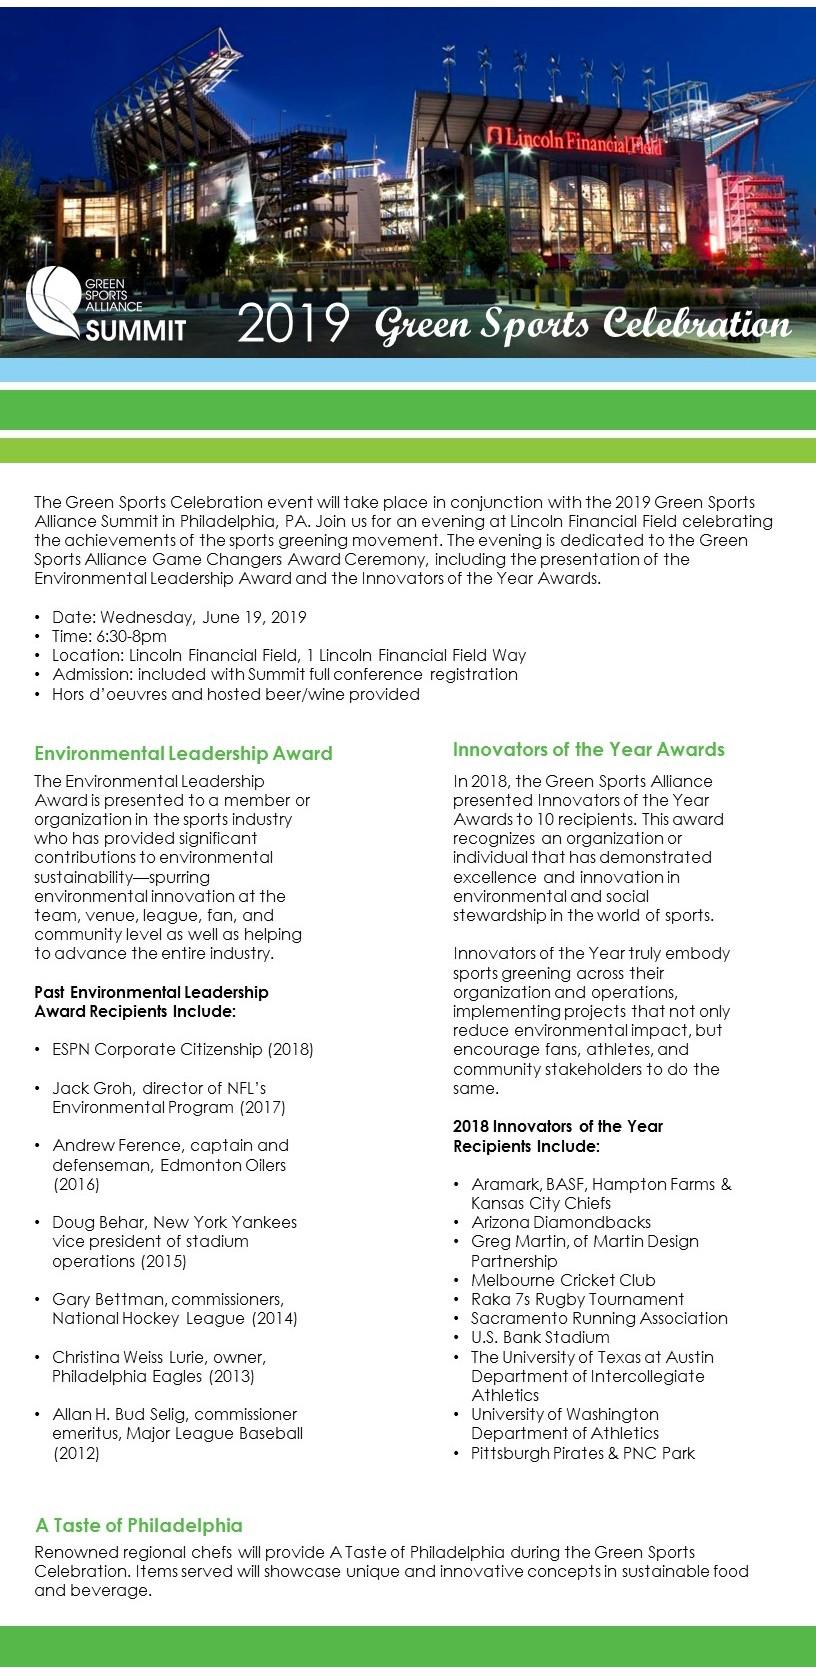 https://greensportsalliance.org/wp-content/uploads/2019/05/2019-Celebration-Overview-for-Webpage.jpg